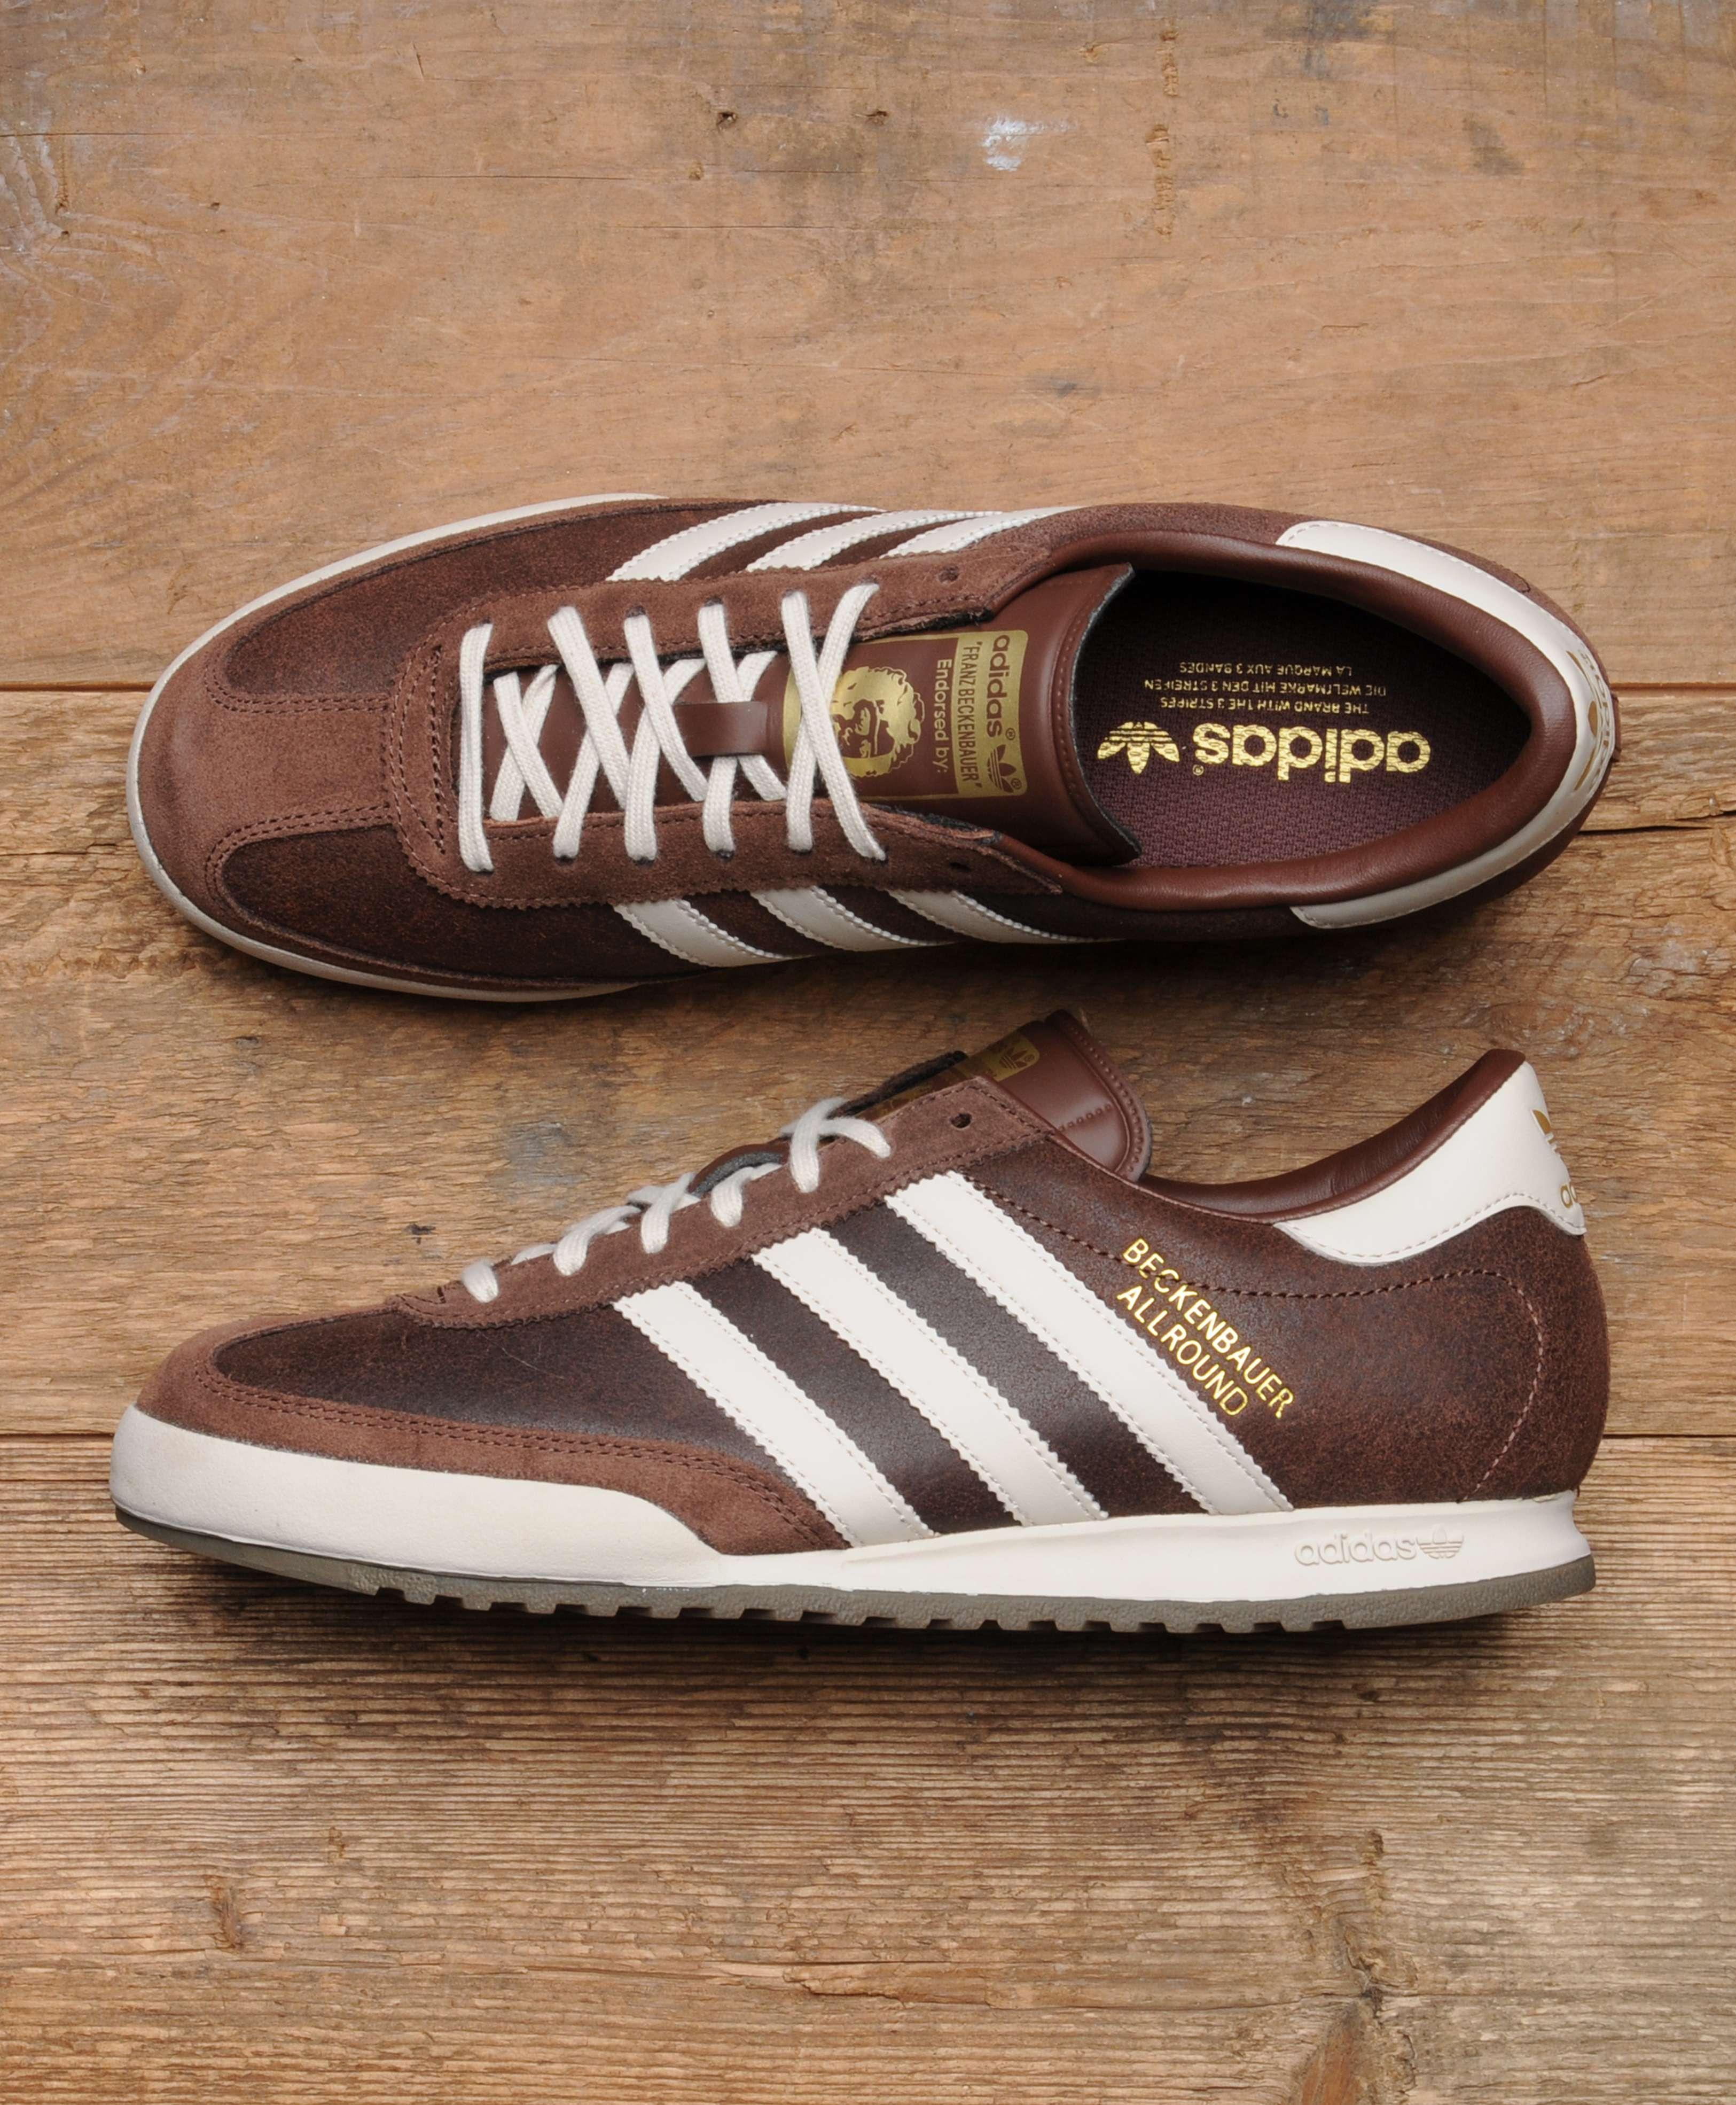 3c5629fbc839 adidas Originals Beckenbauer